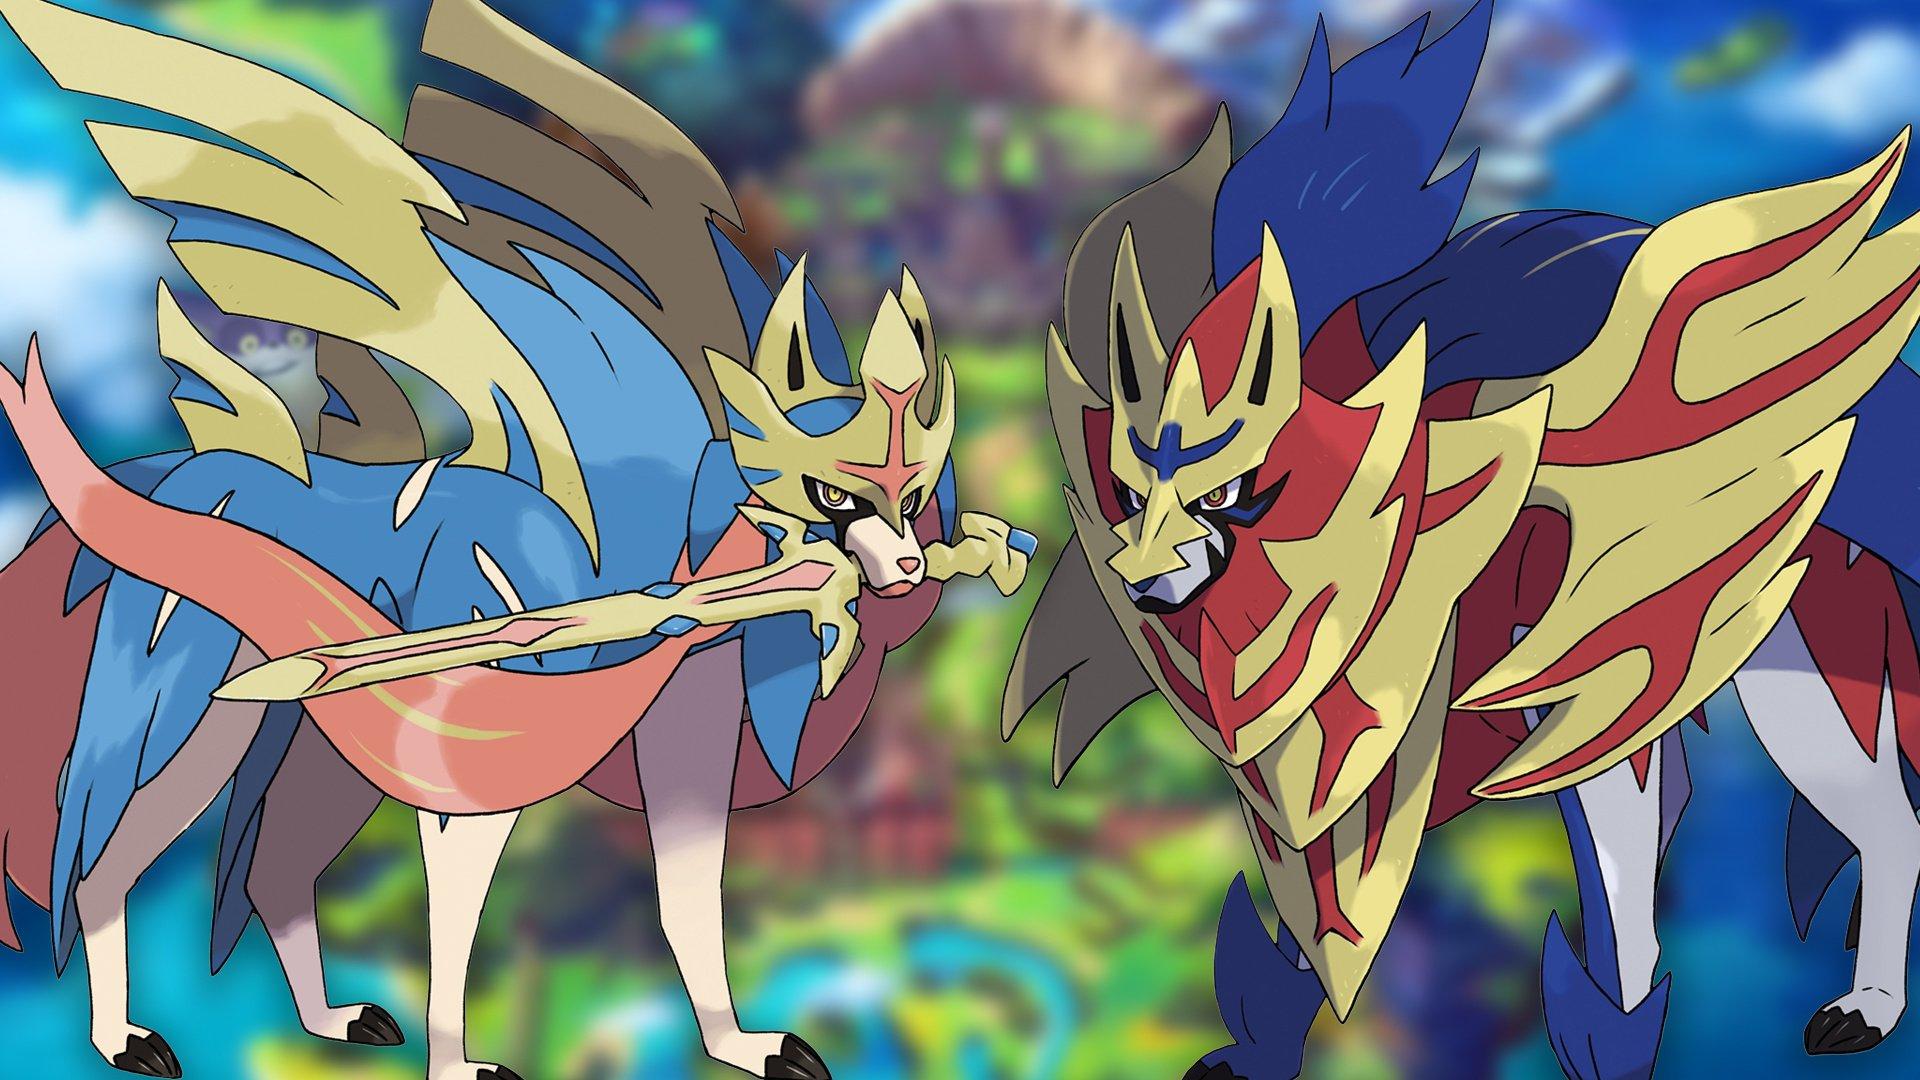 Pokémon Sword And Shield Dethrones Diamond & Pearl In New Famitsu Sales Chart Record